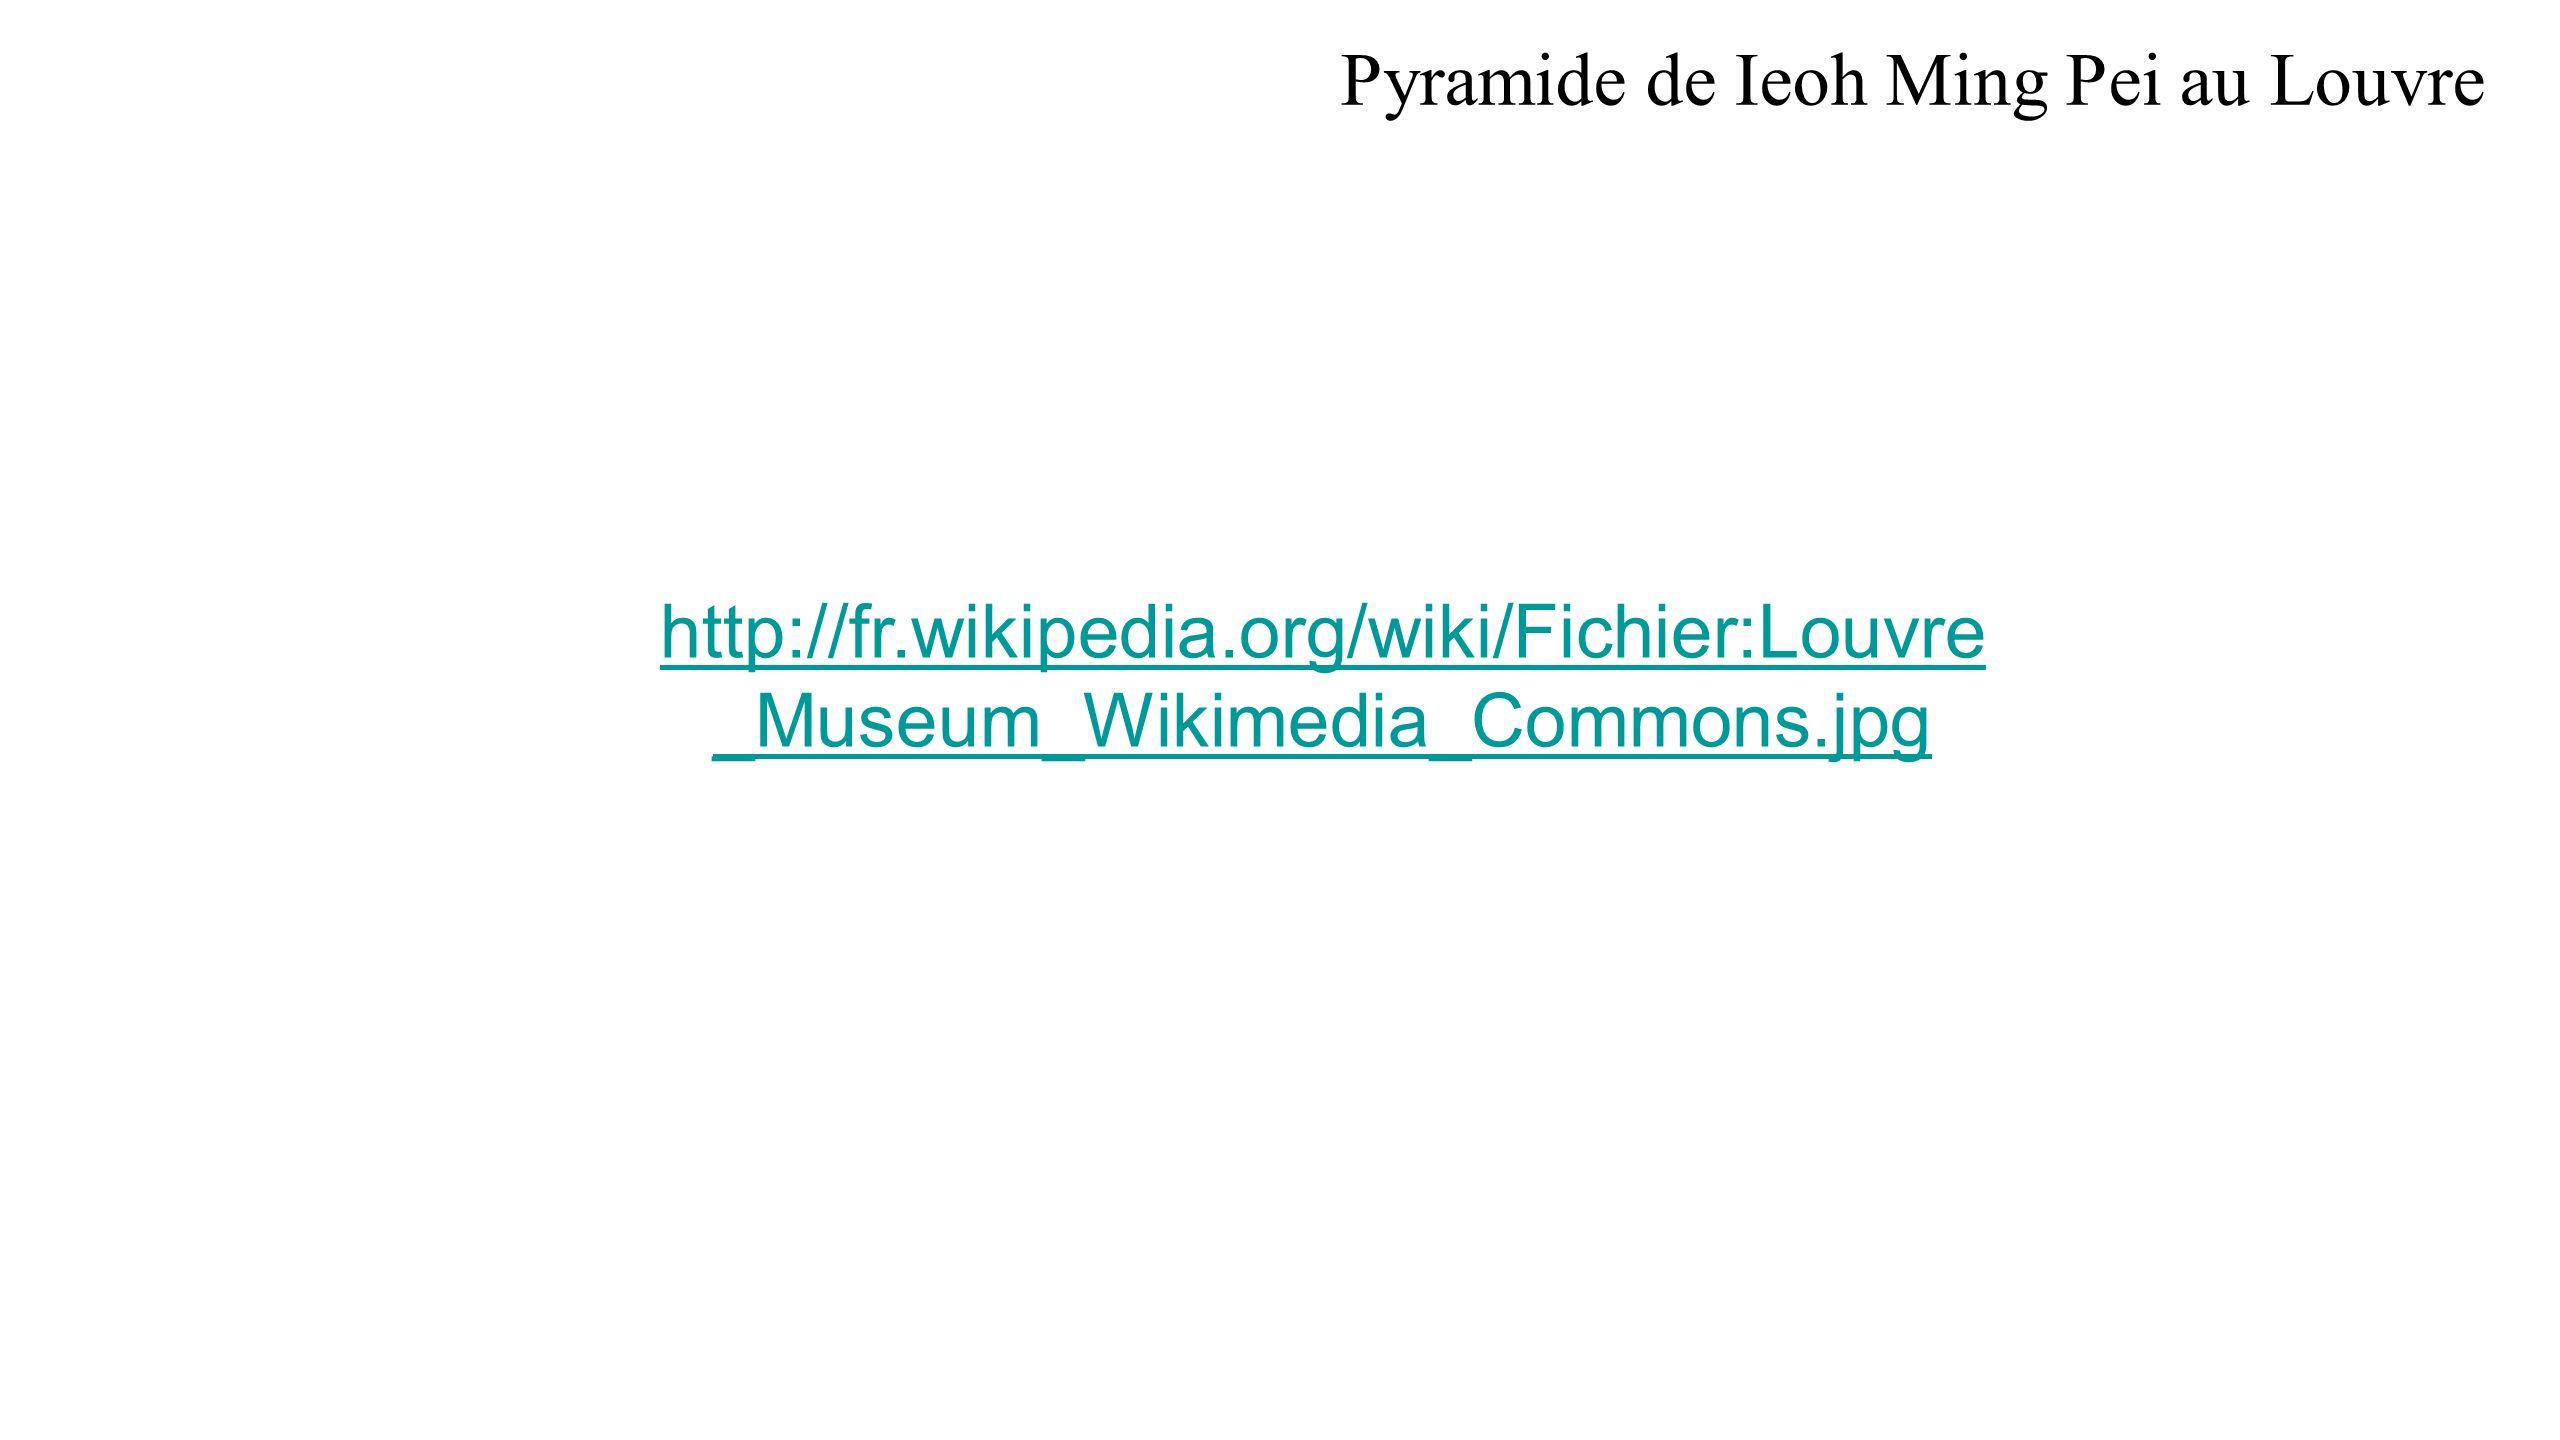 Pyramide de Ieoh Ming Pei au Louvre http://fr.wikipedia.org/wiki/Fichier:Louvre _Museum_Wikimedia_Commons.jpg